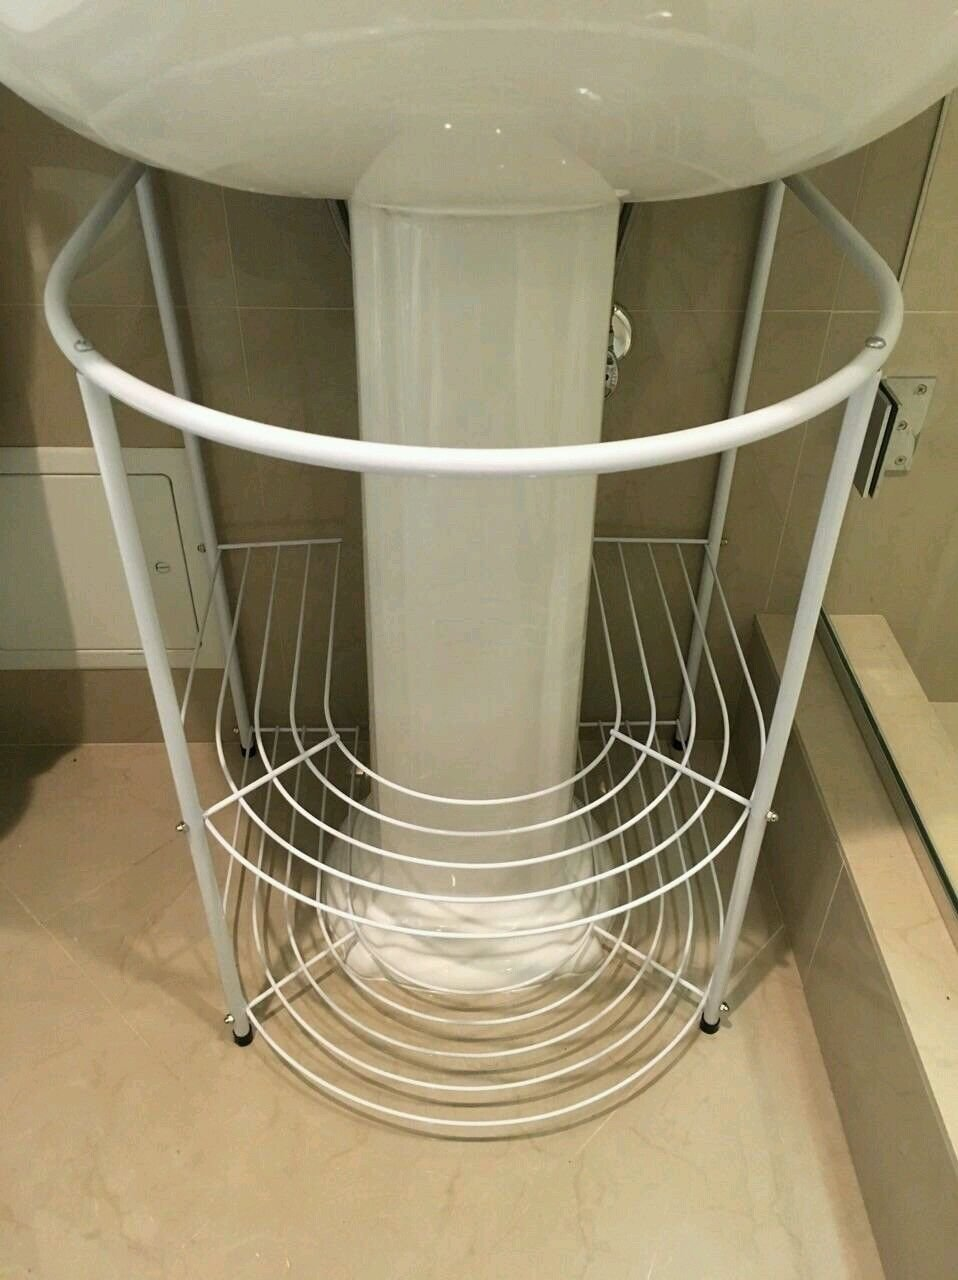 Bathroom Storage Rack white Under Pedestal Sink Towels Stand Modern Shelves trois_s Does not apply